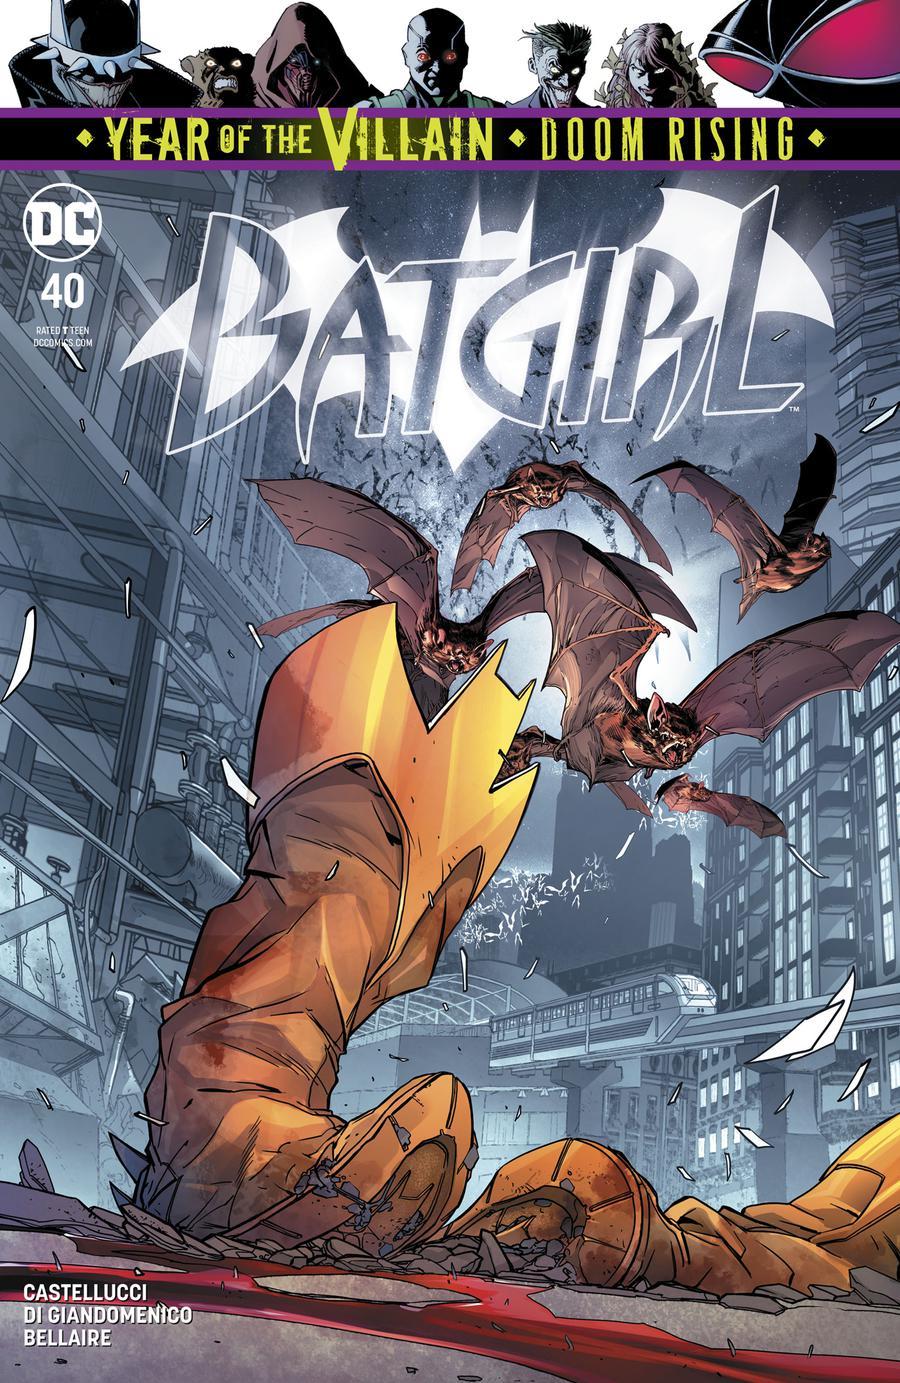 Batgirl Vol 5 #40 Cover A Regular Carmine Di Giandomenico Cover (Year Of The Villain Doom Rising Tie-In)